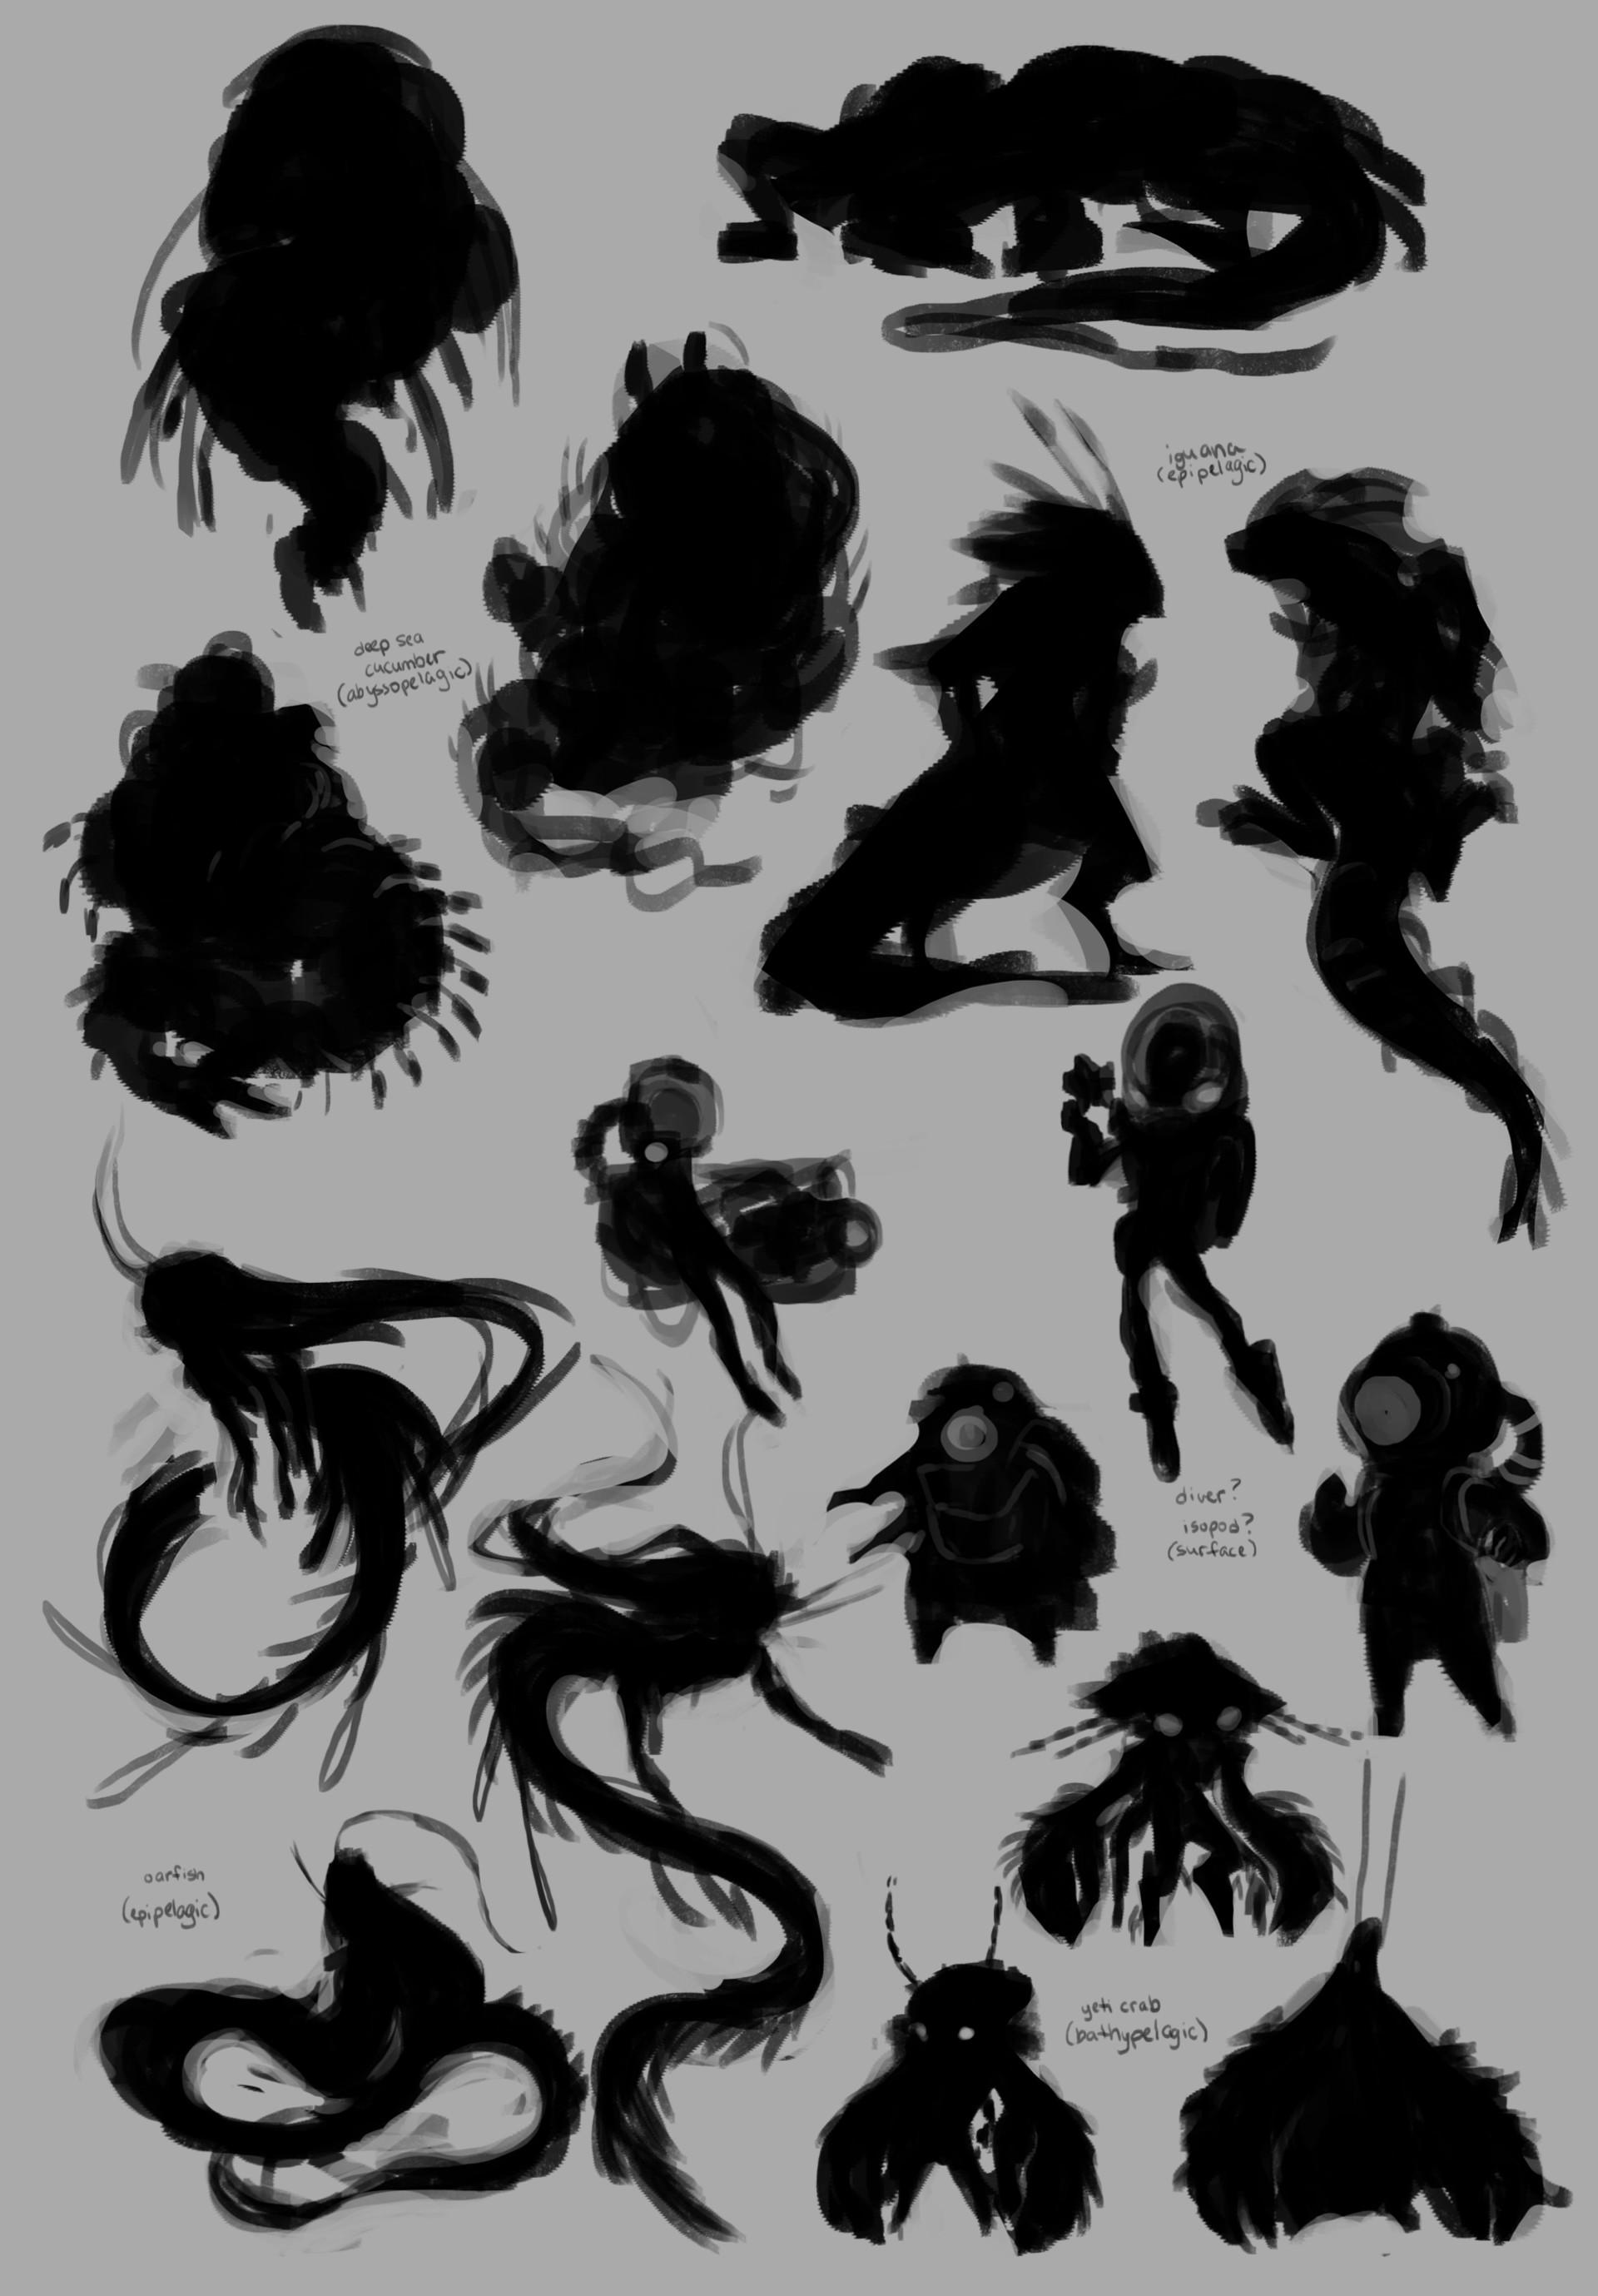 Dani kruse btw adventurer silhouettes